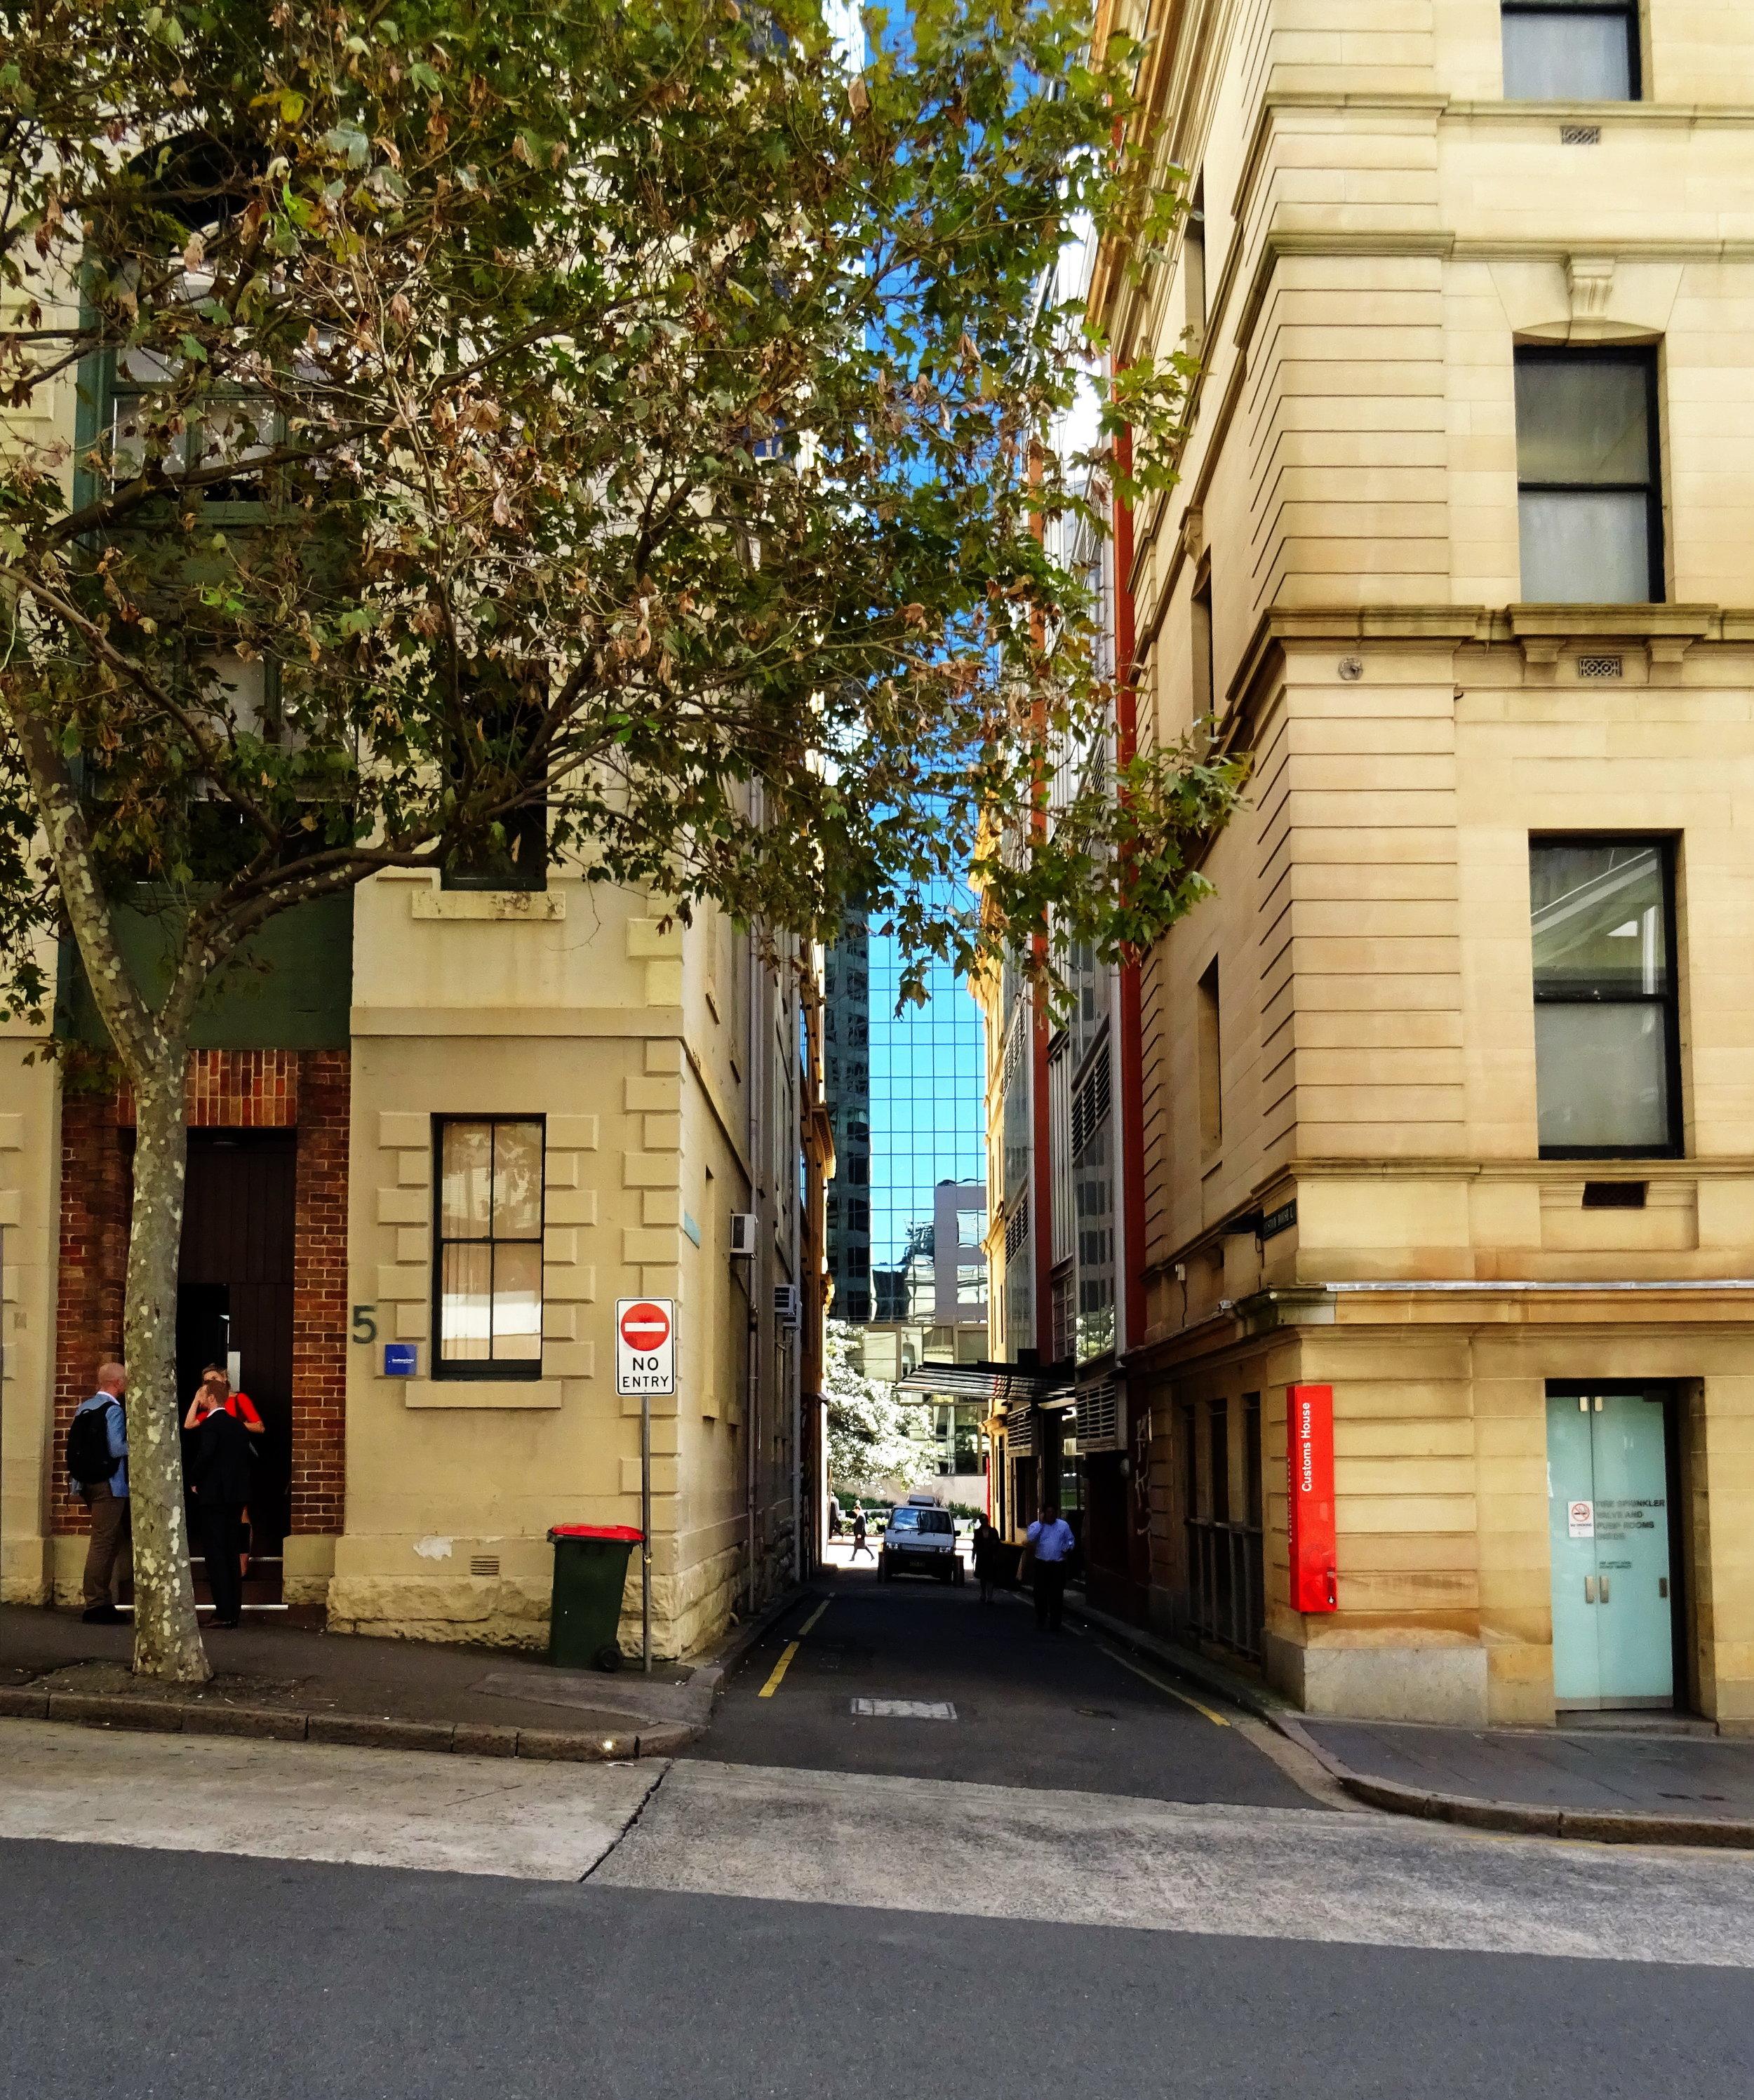 NSW, Sydney